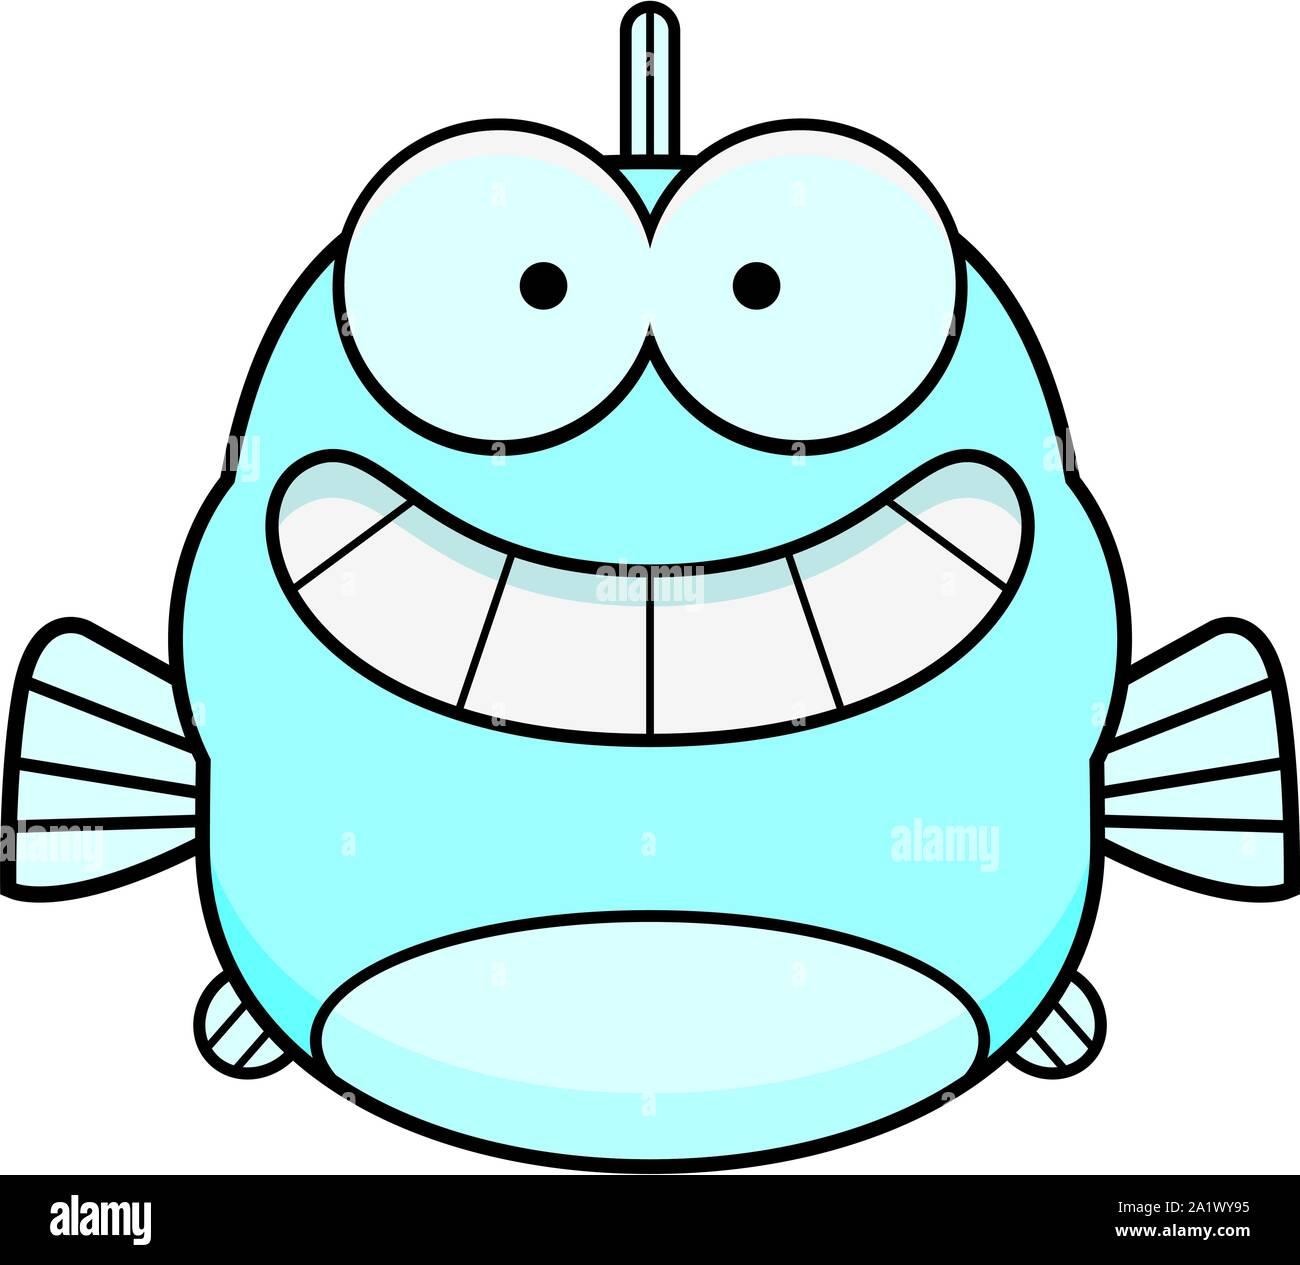 A cartoon illustration of a fish looking happy. Stock Vector